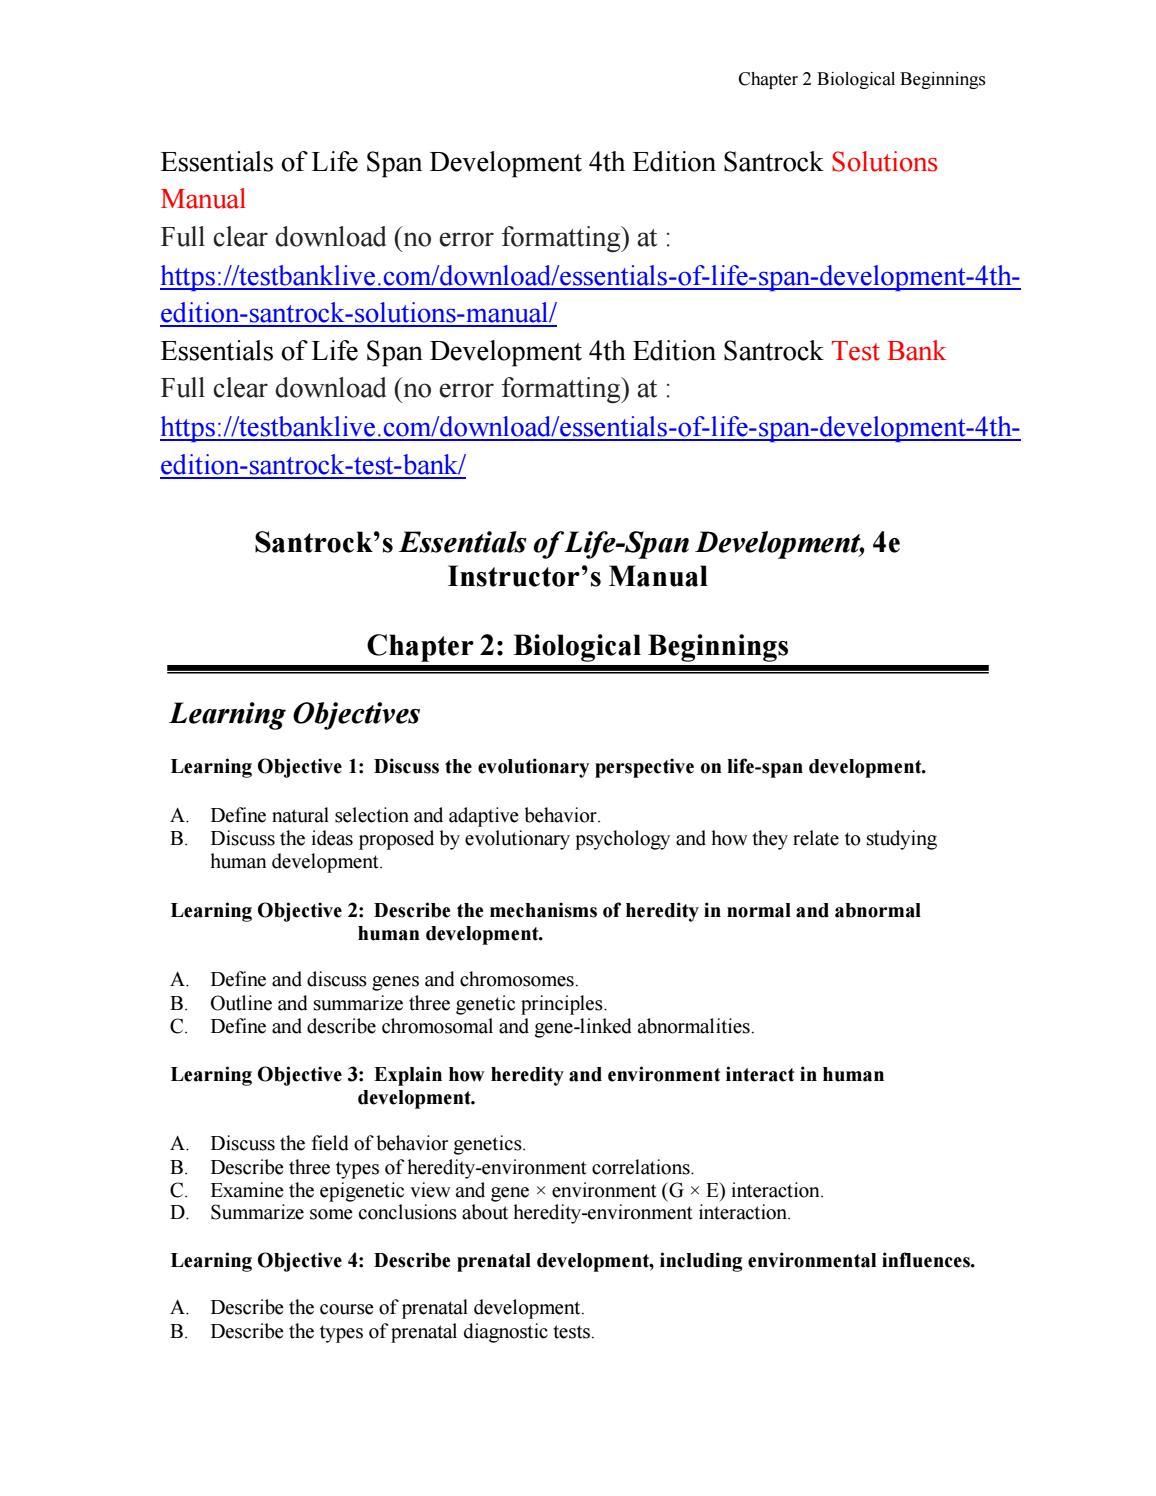 Essentials of life span development 4th edition santrock solutions manual  by bill565 - issuu